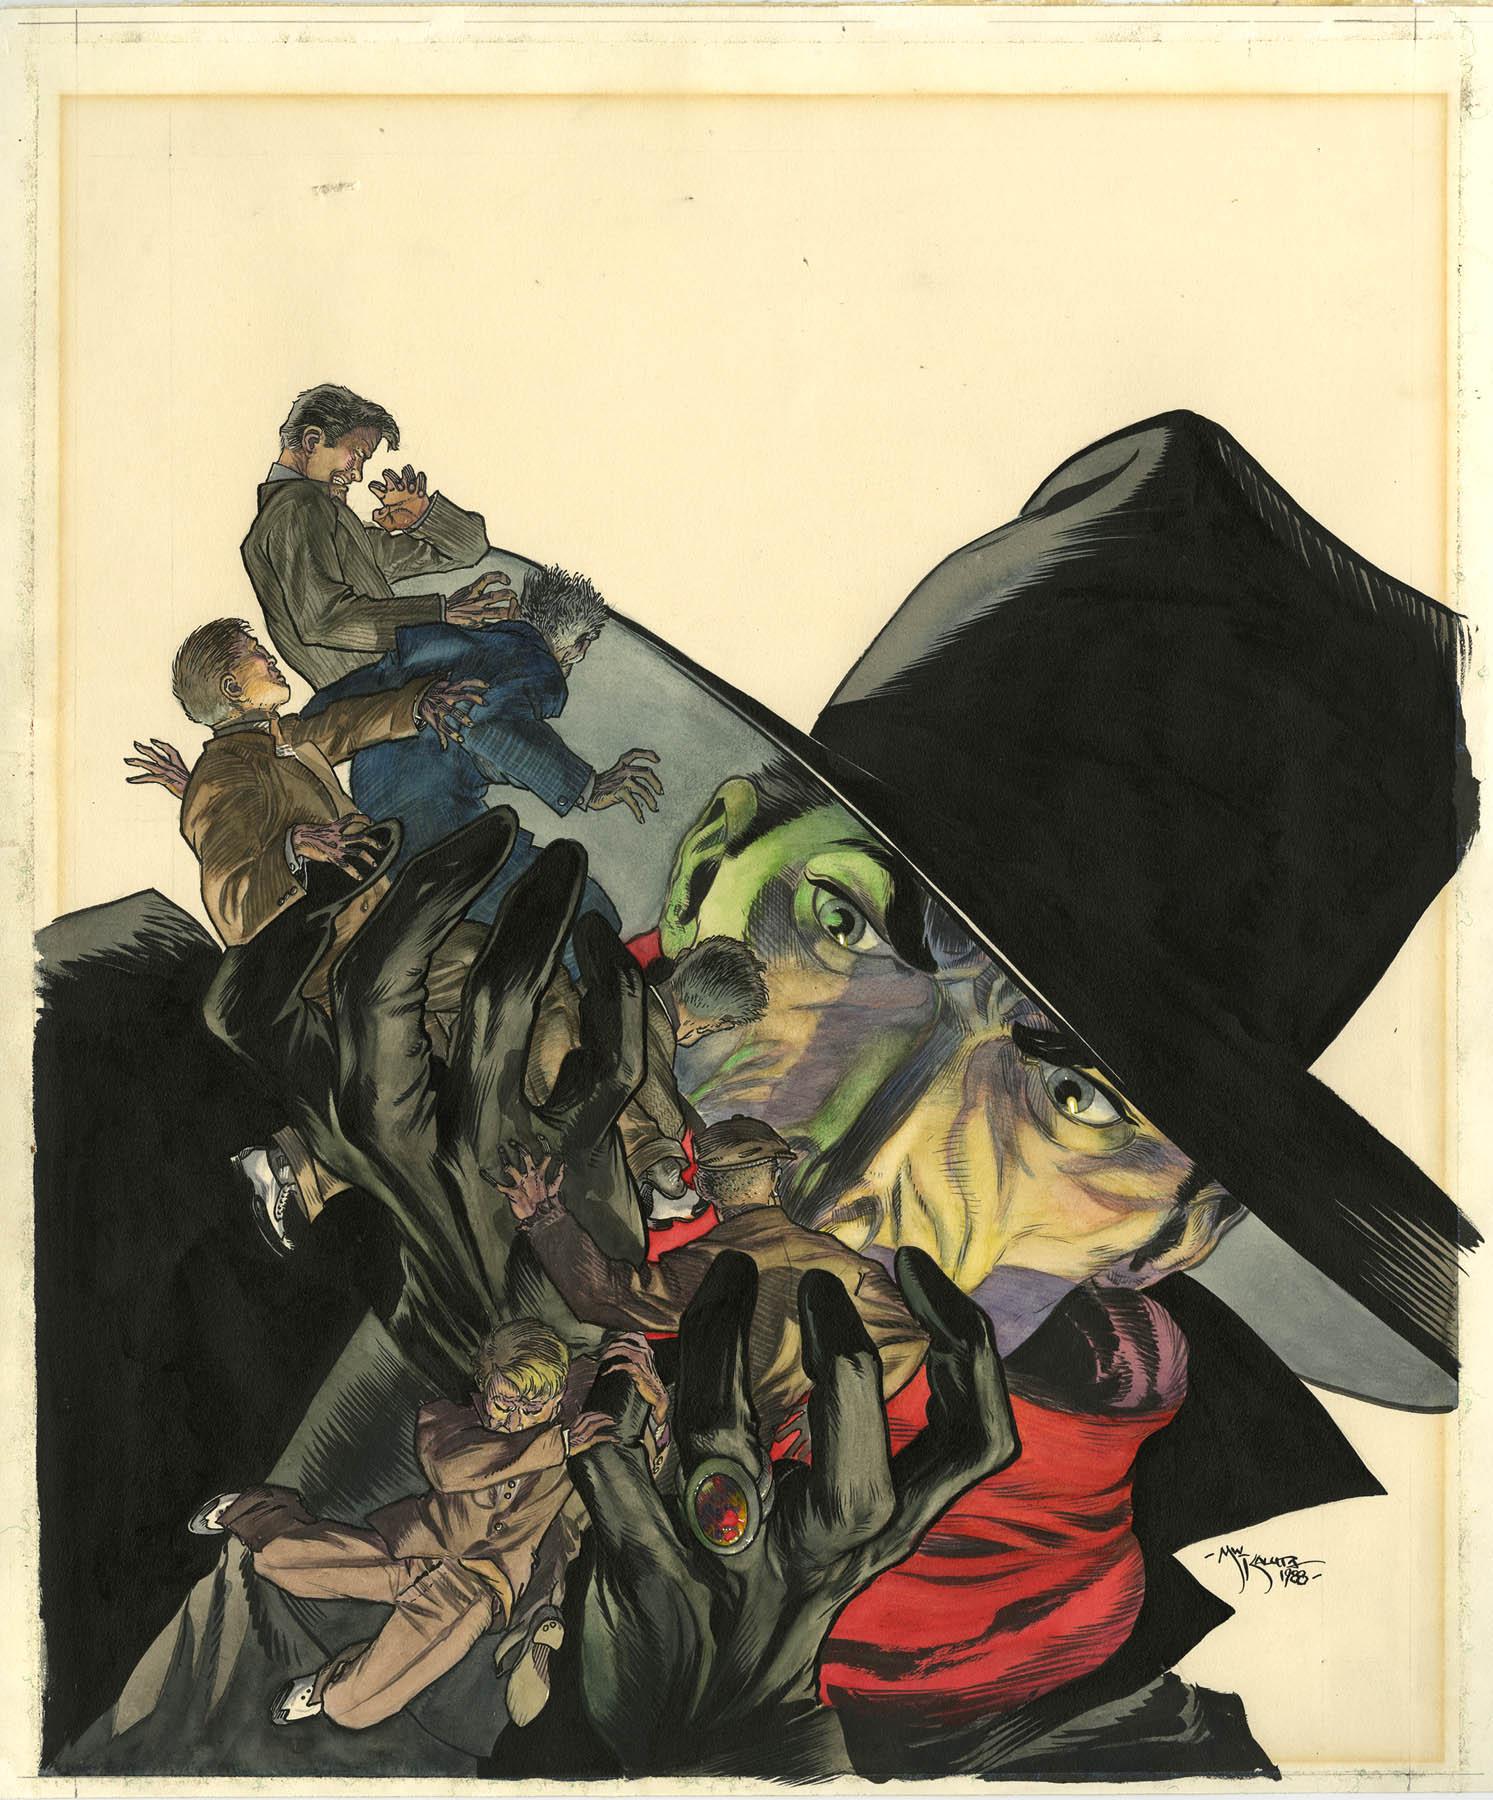 ComicLink Spring Featured Auction Original Art 2015